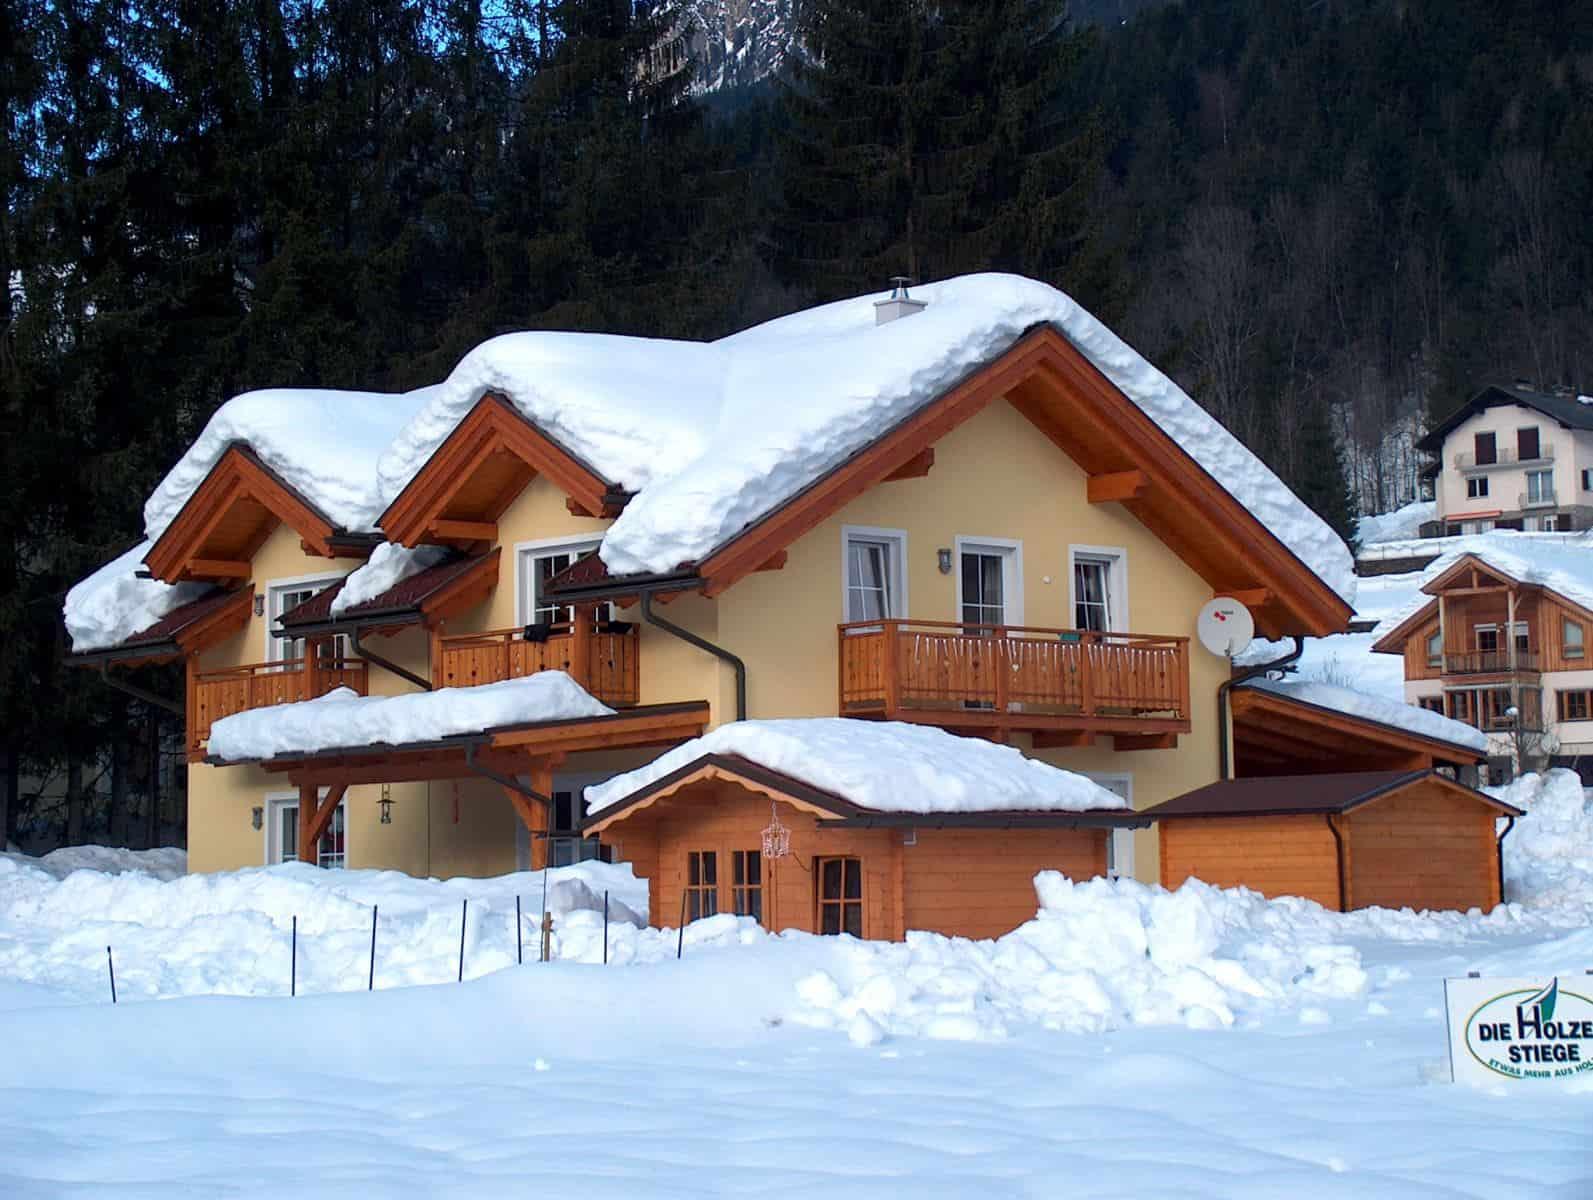 KWO villa te koop - winter